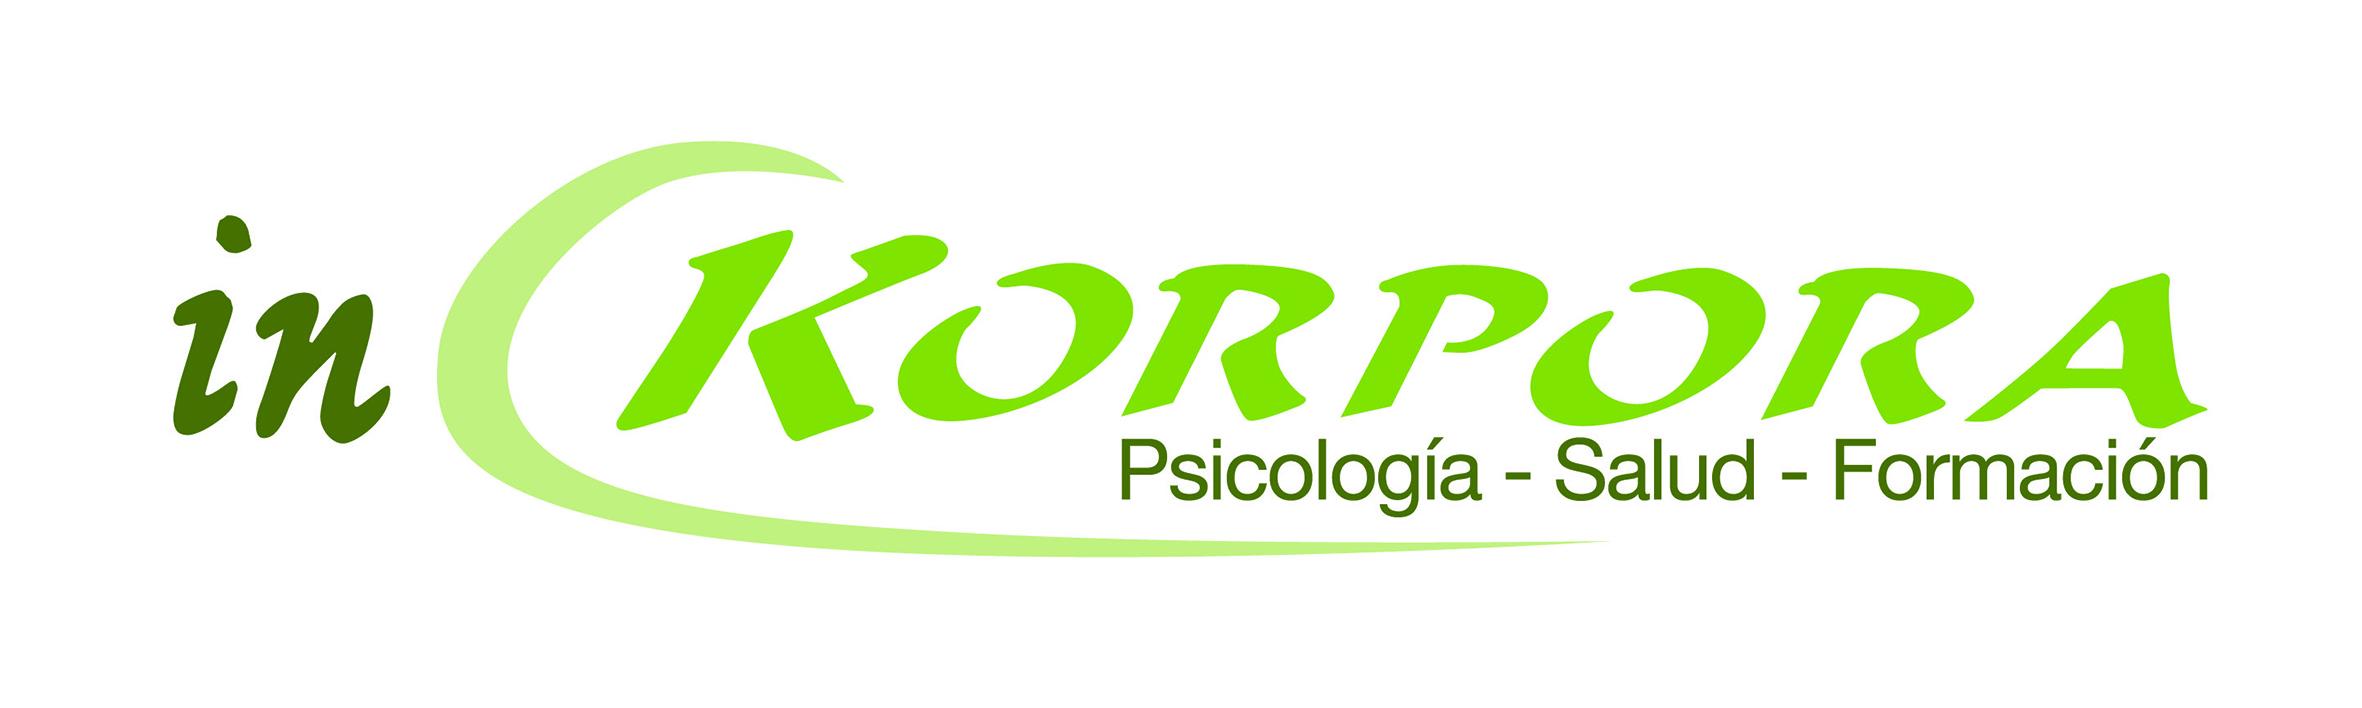 Página web Psicologia Inckorpora diseño grafico